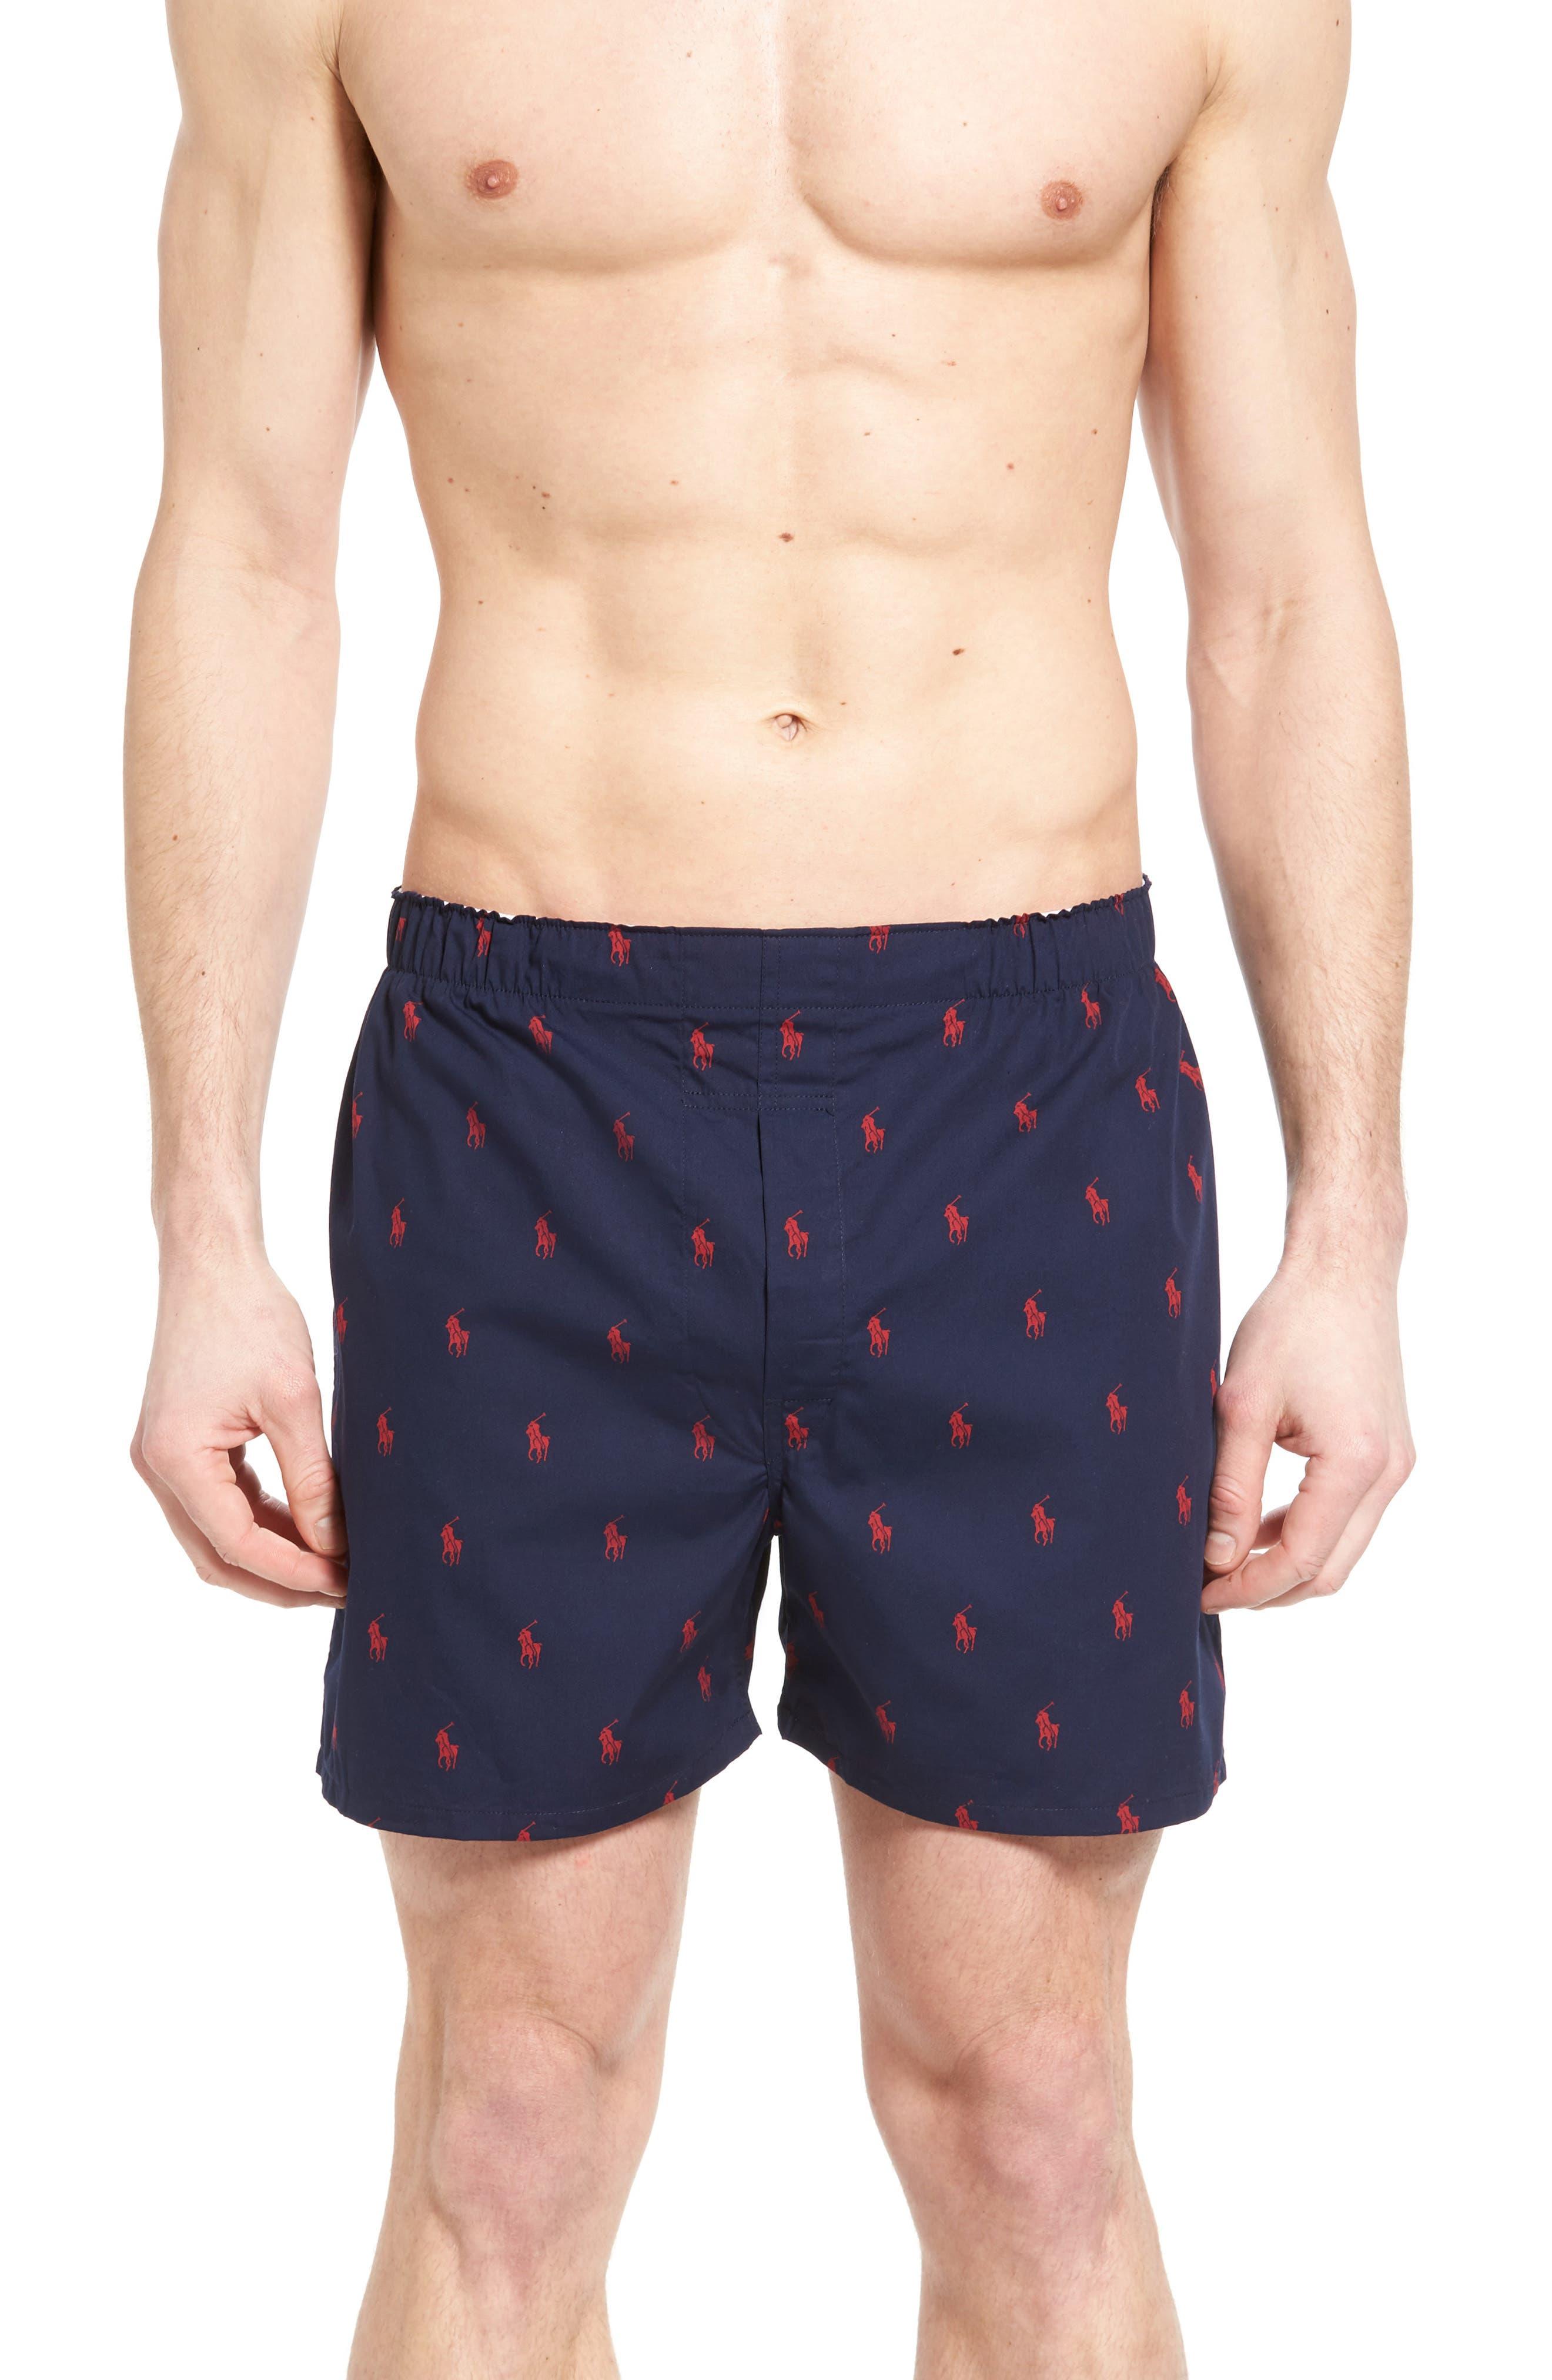 3-Pack Woven Cotton Boxers,                             Alternate thumbnail 2, color,                             Navy/ Red Plaid/ Blue Plaid